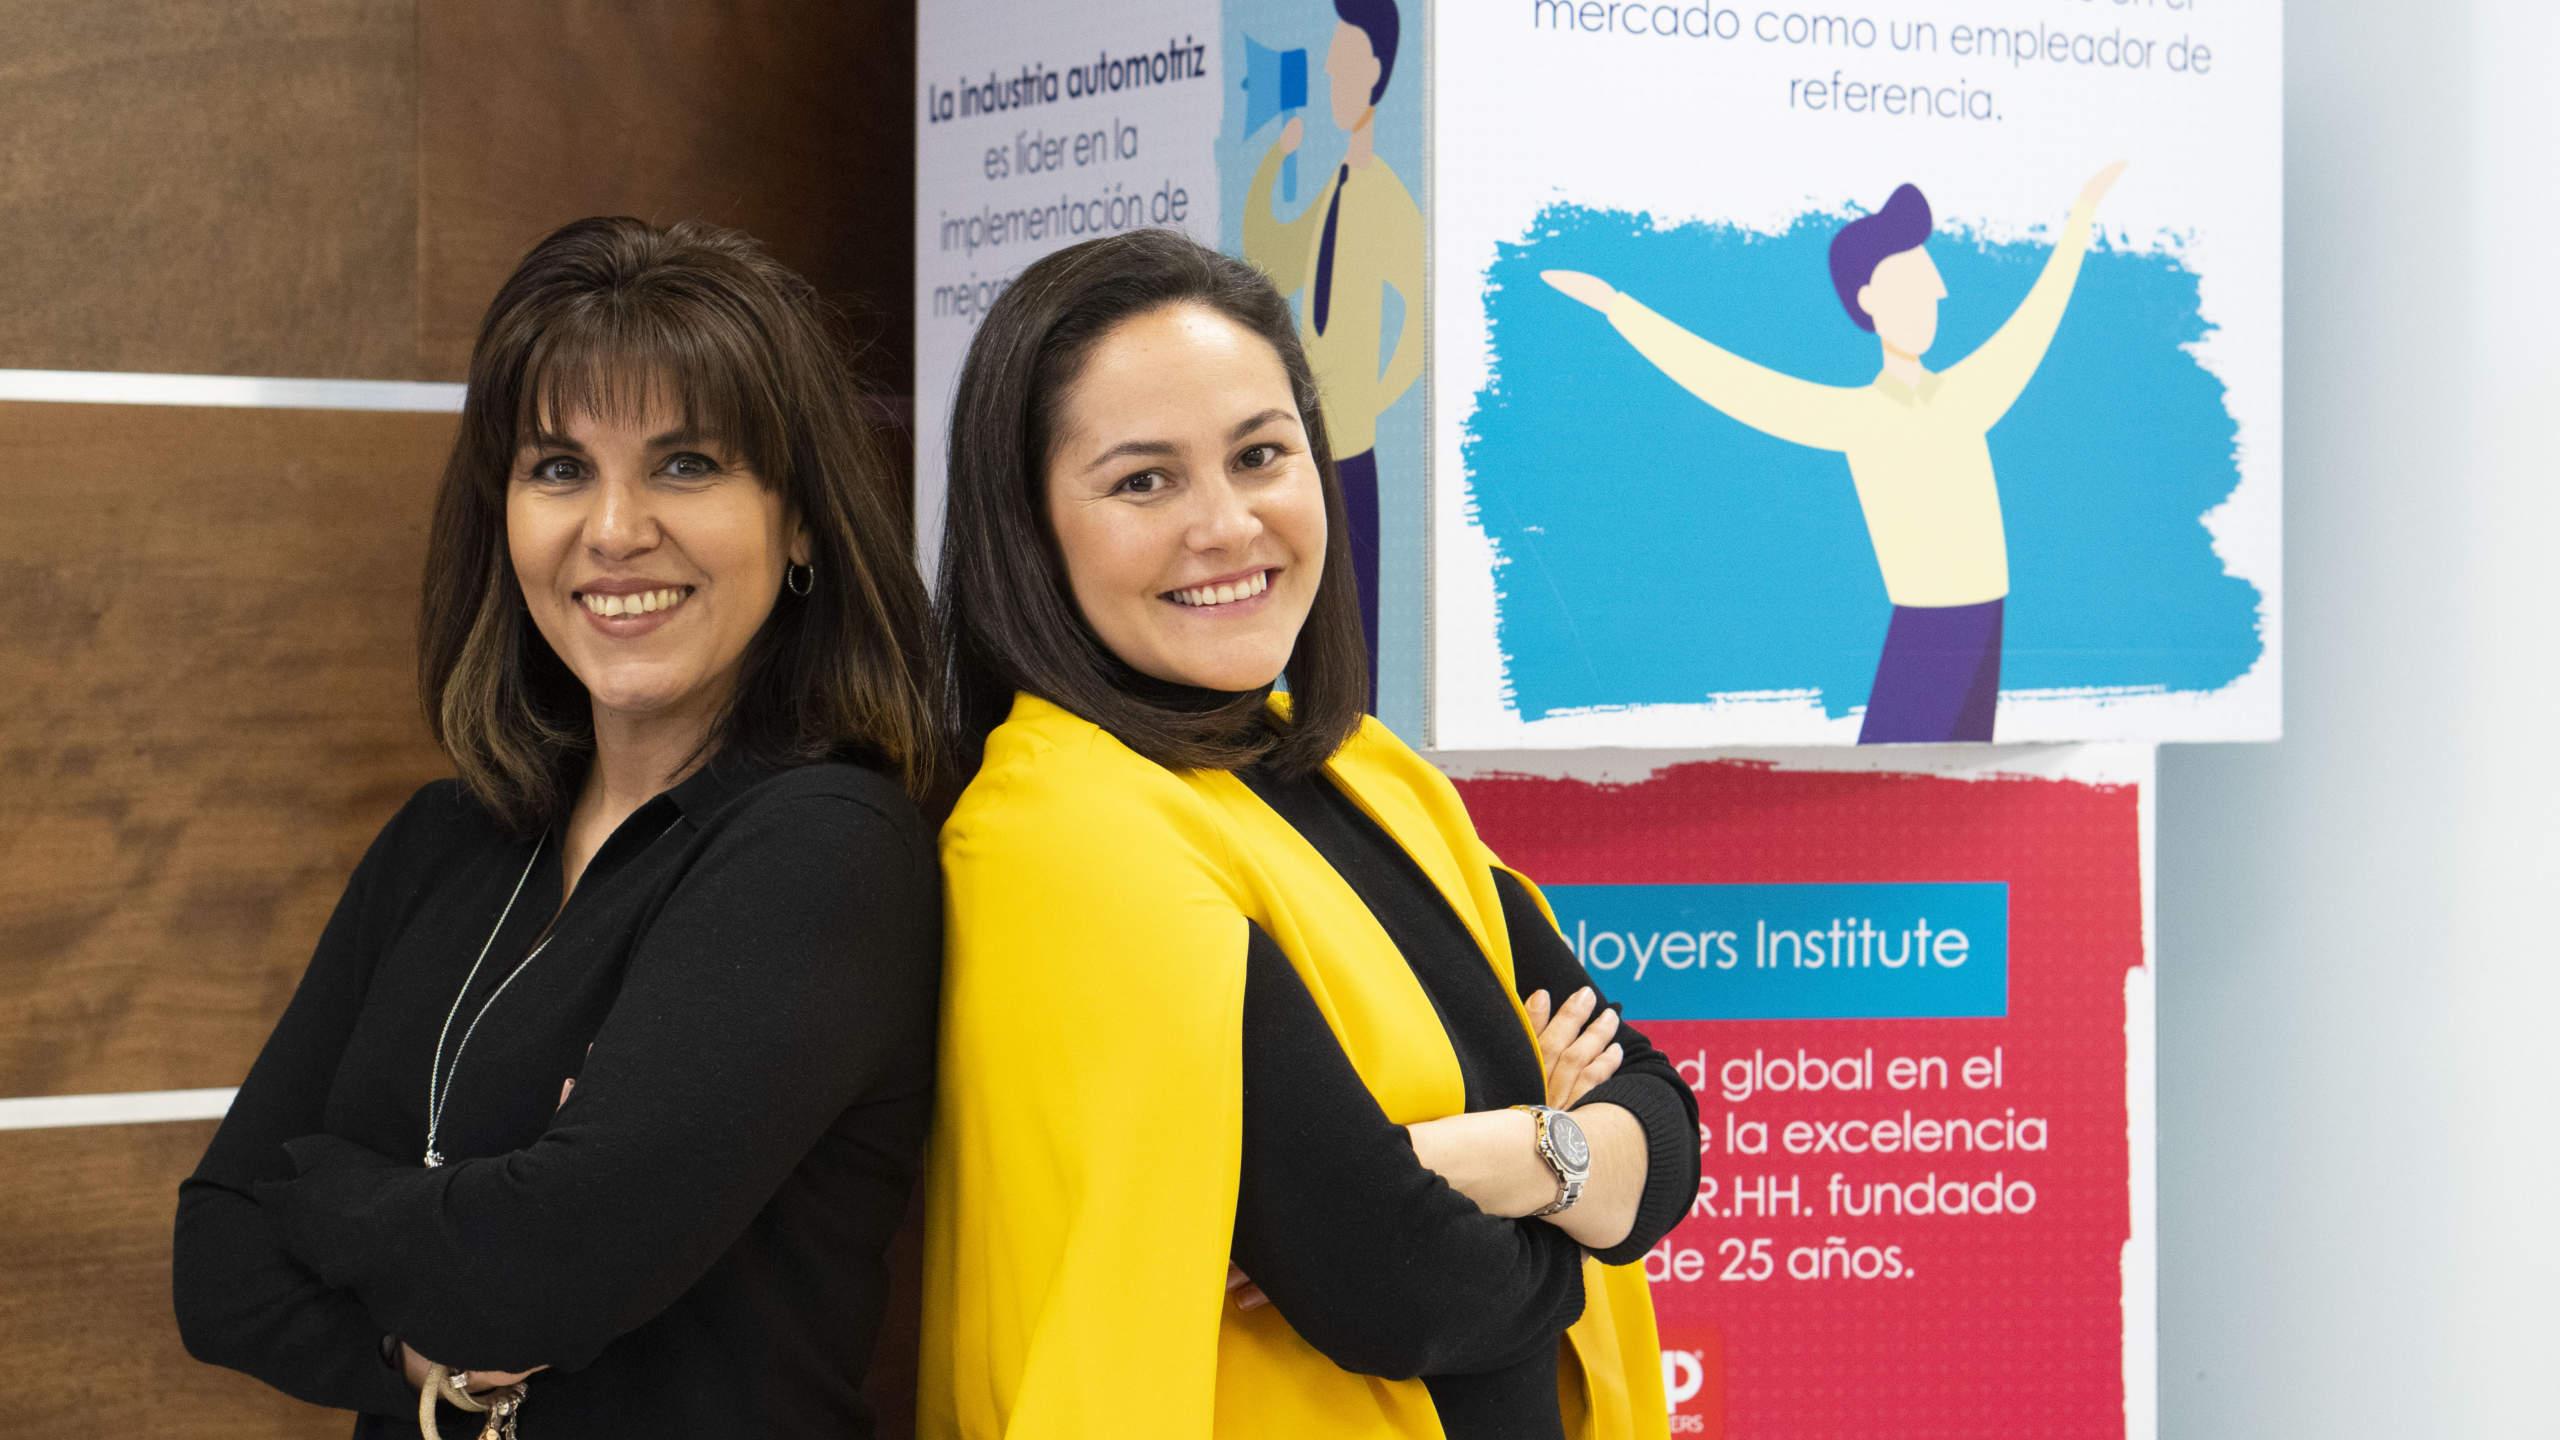 Faurecia Mexico promotes female talent